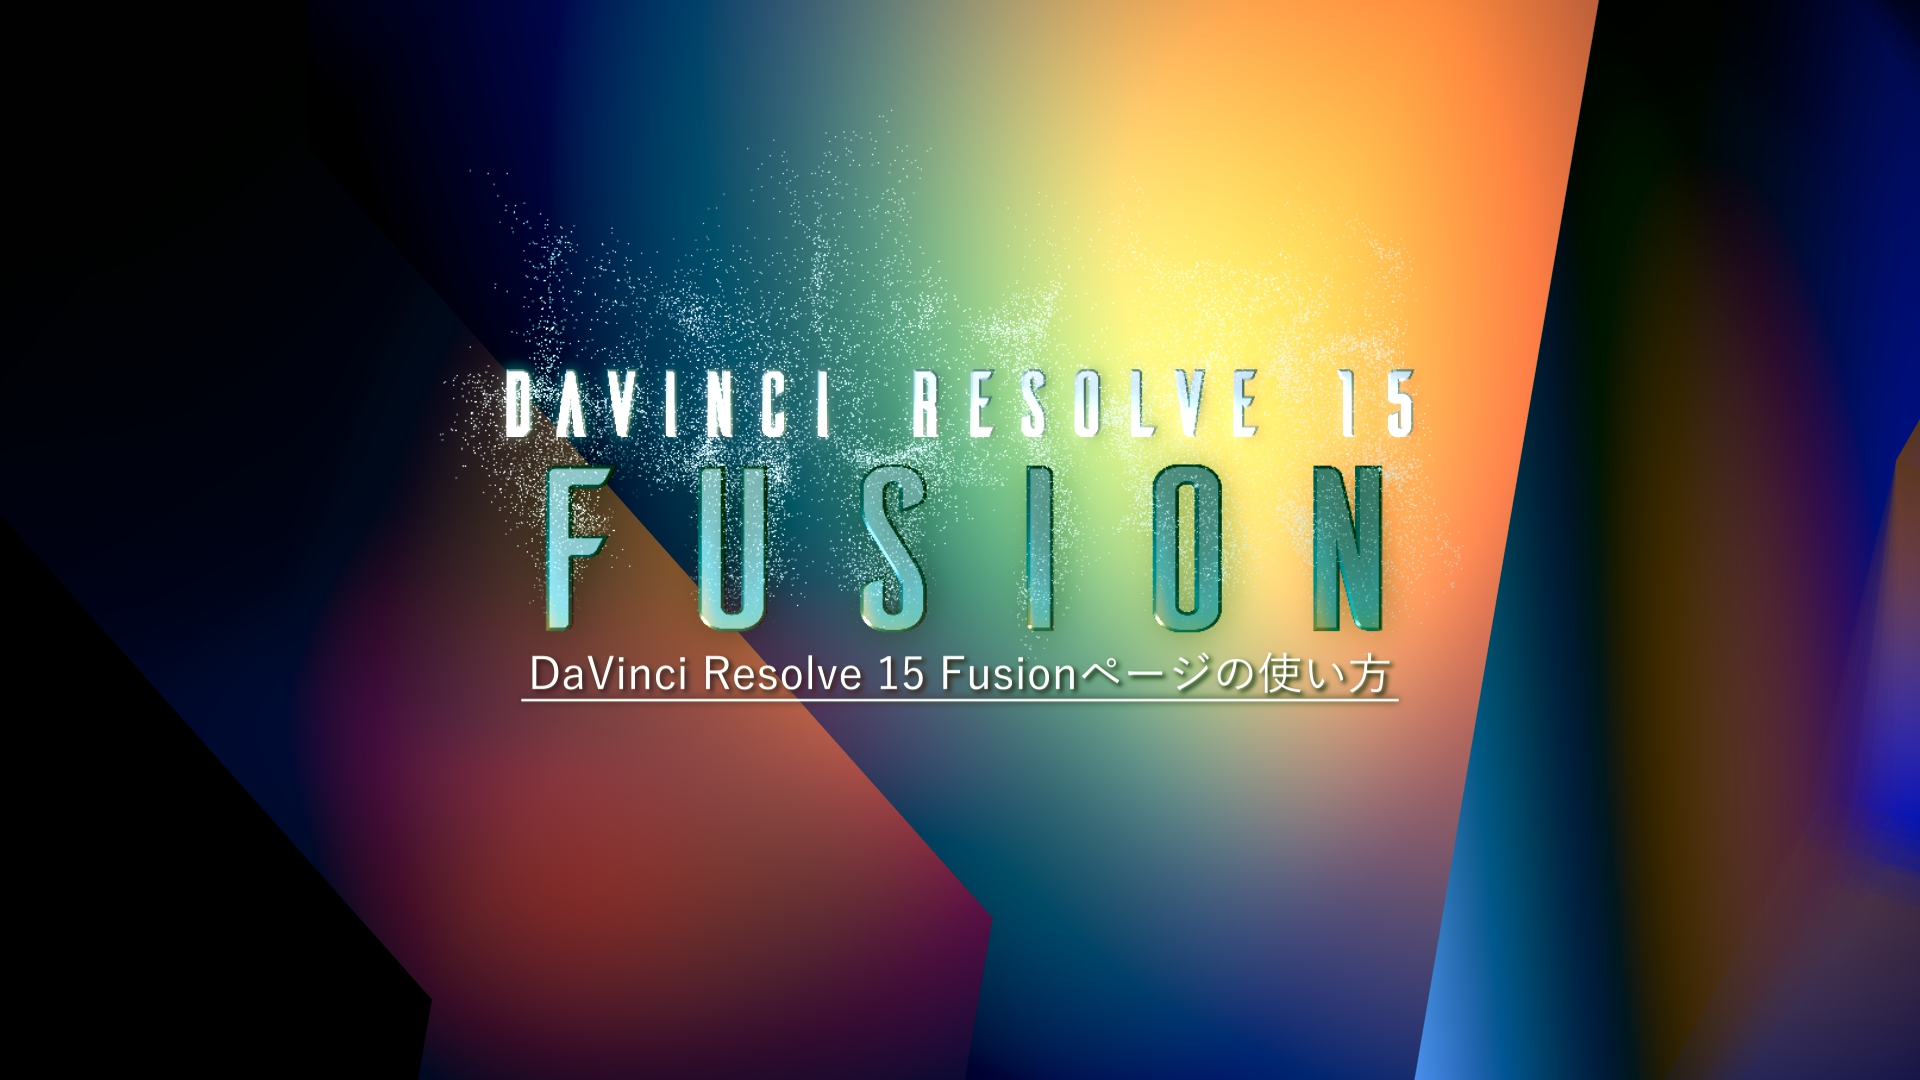 DaVinci Resolve 15 Fusion の 使い方